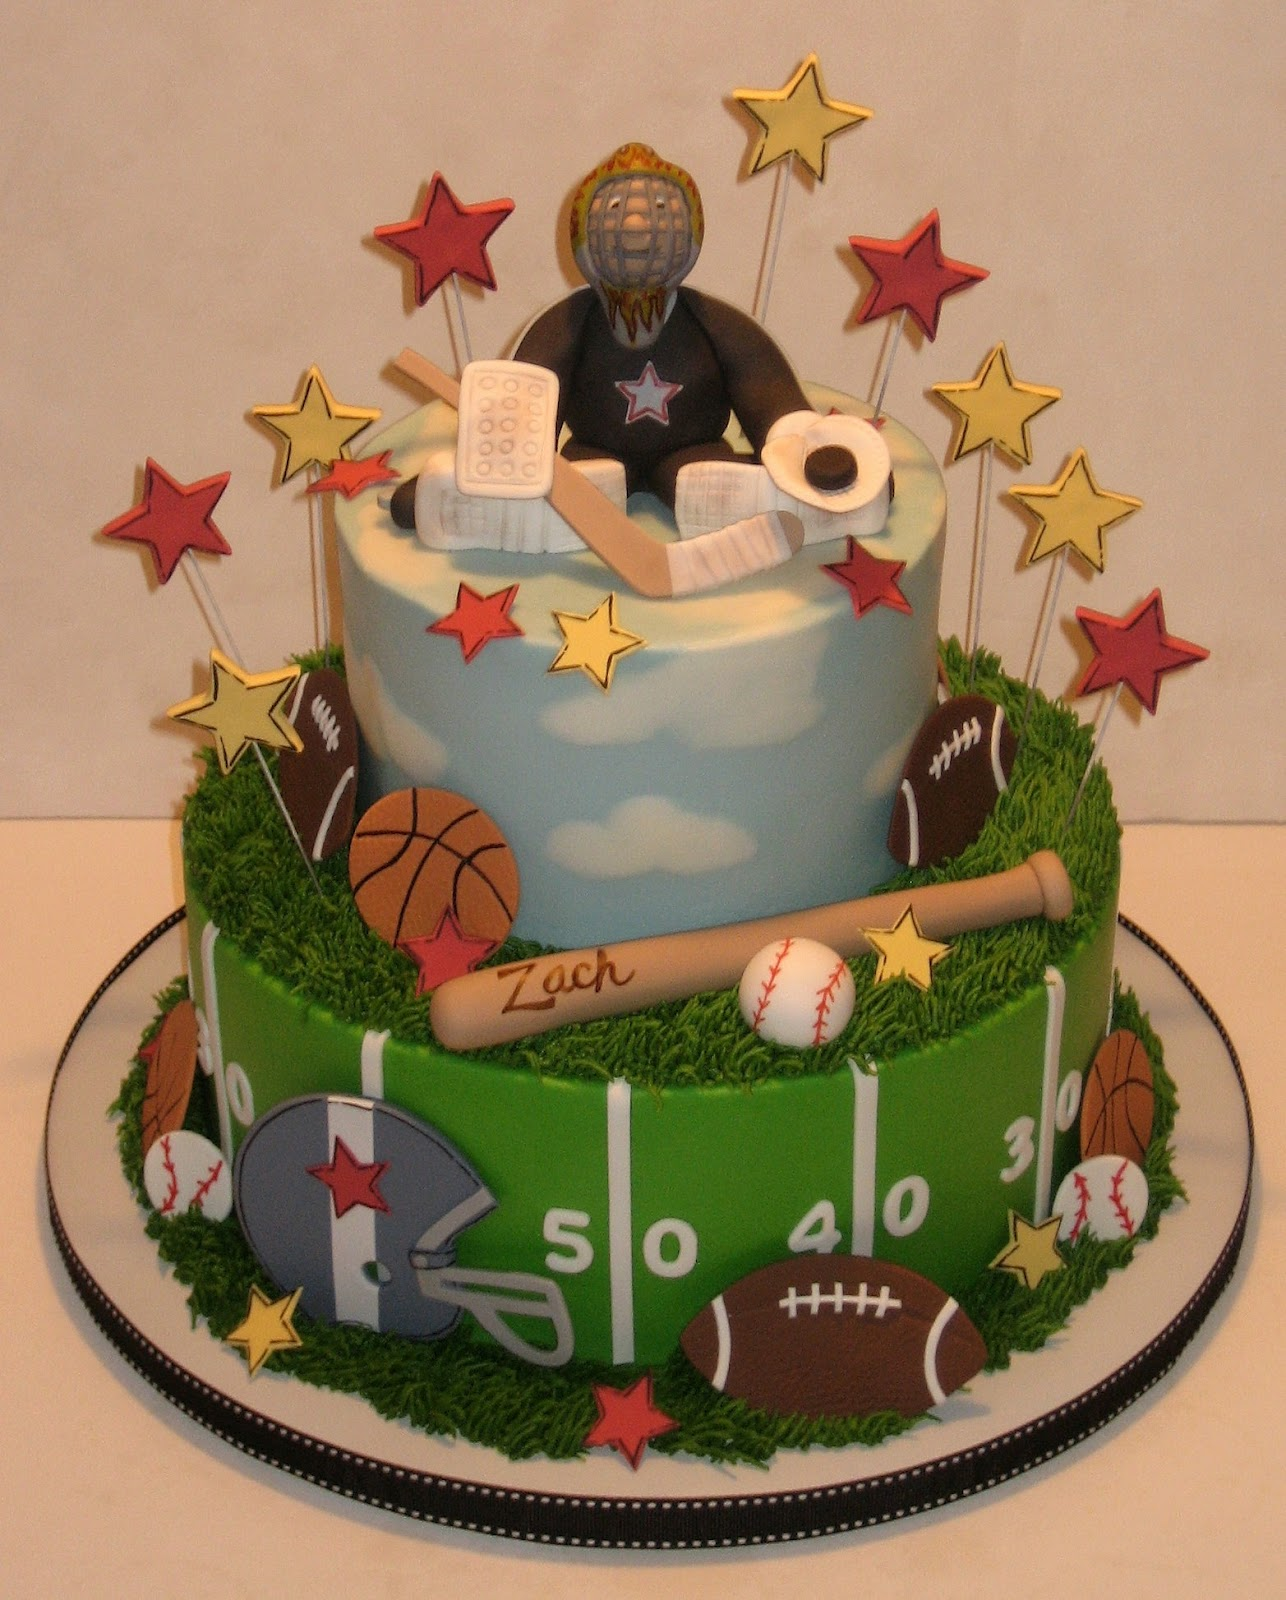 Boys Sports Birthday Cake Ideas And Designs